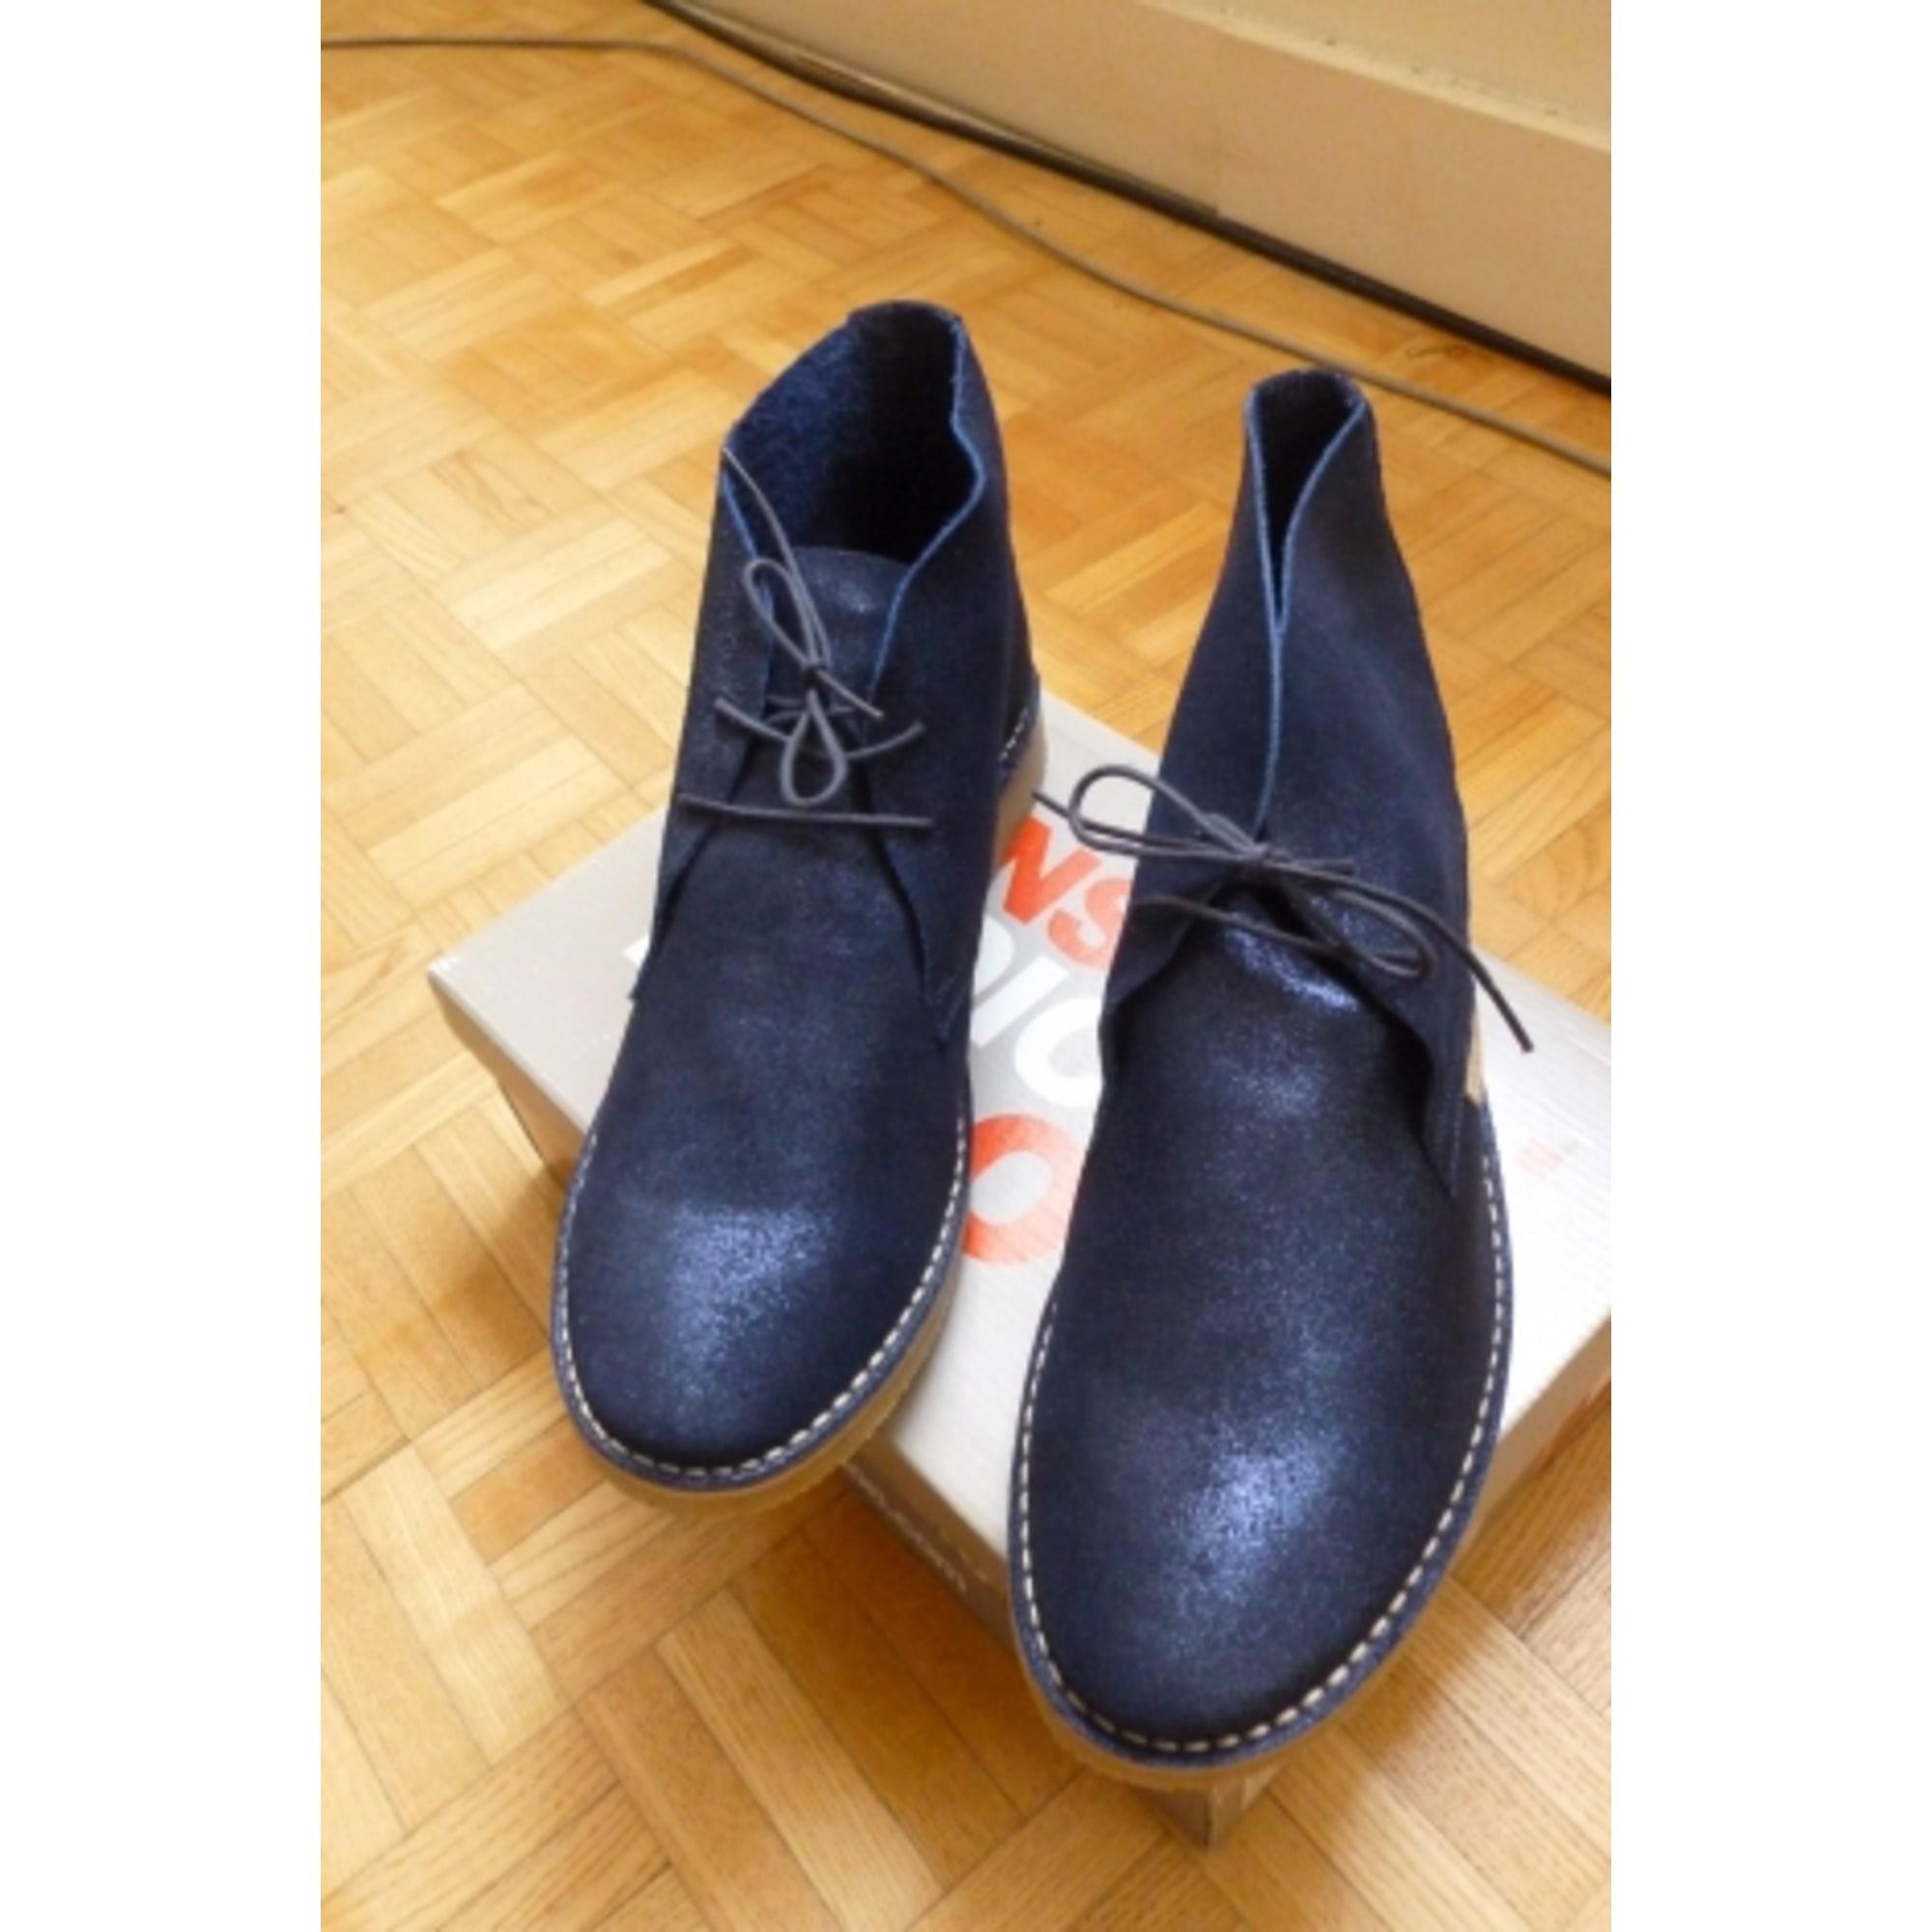 635eaf7fe75 Bottines   low boots plates BENSIMON 41 bleu - 4812977